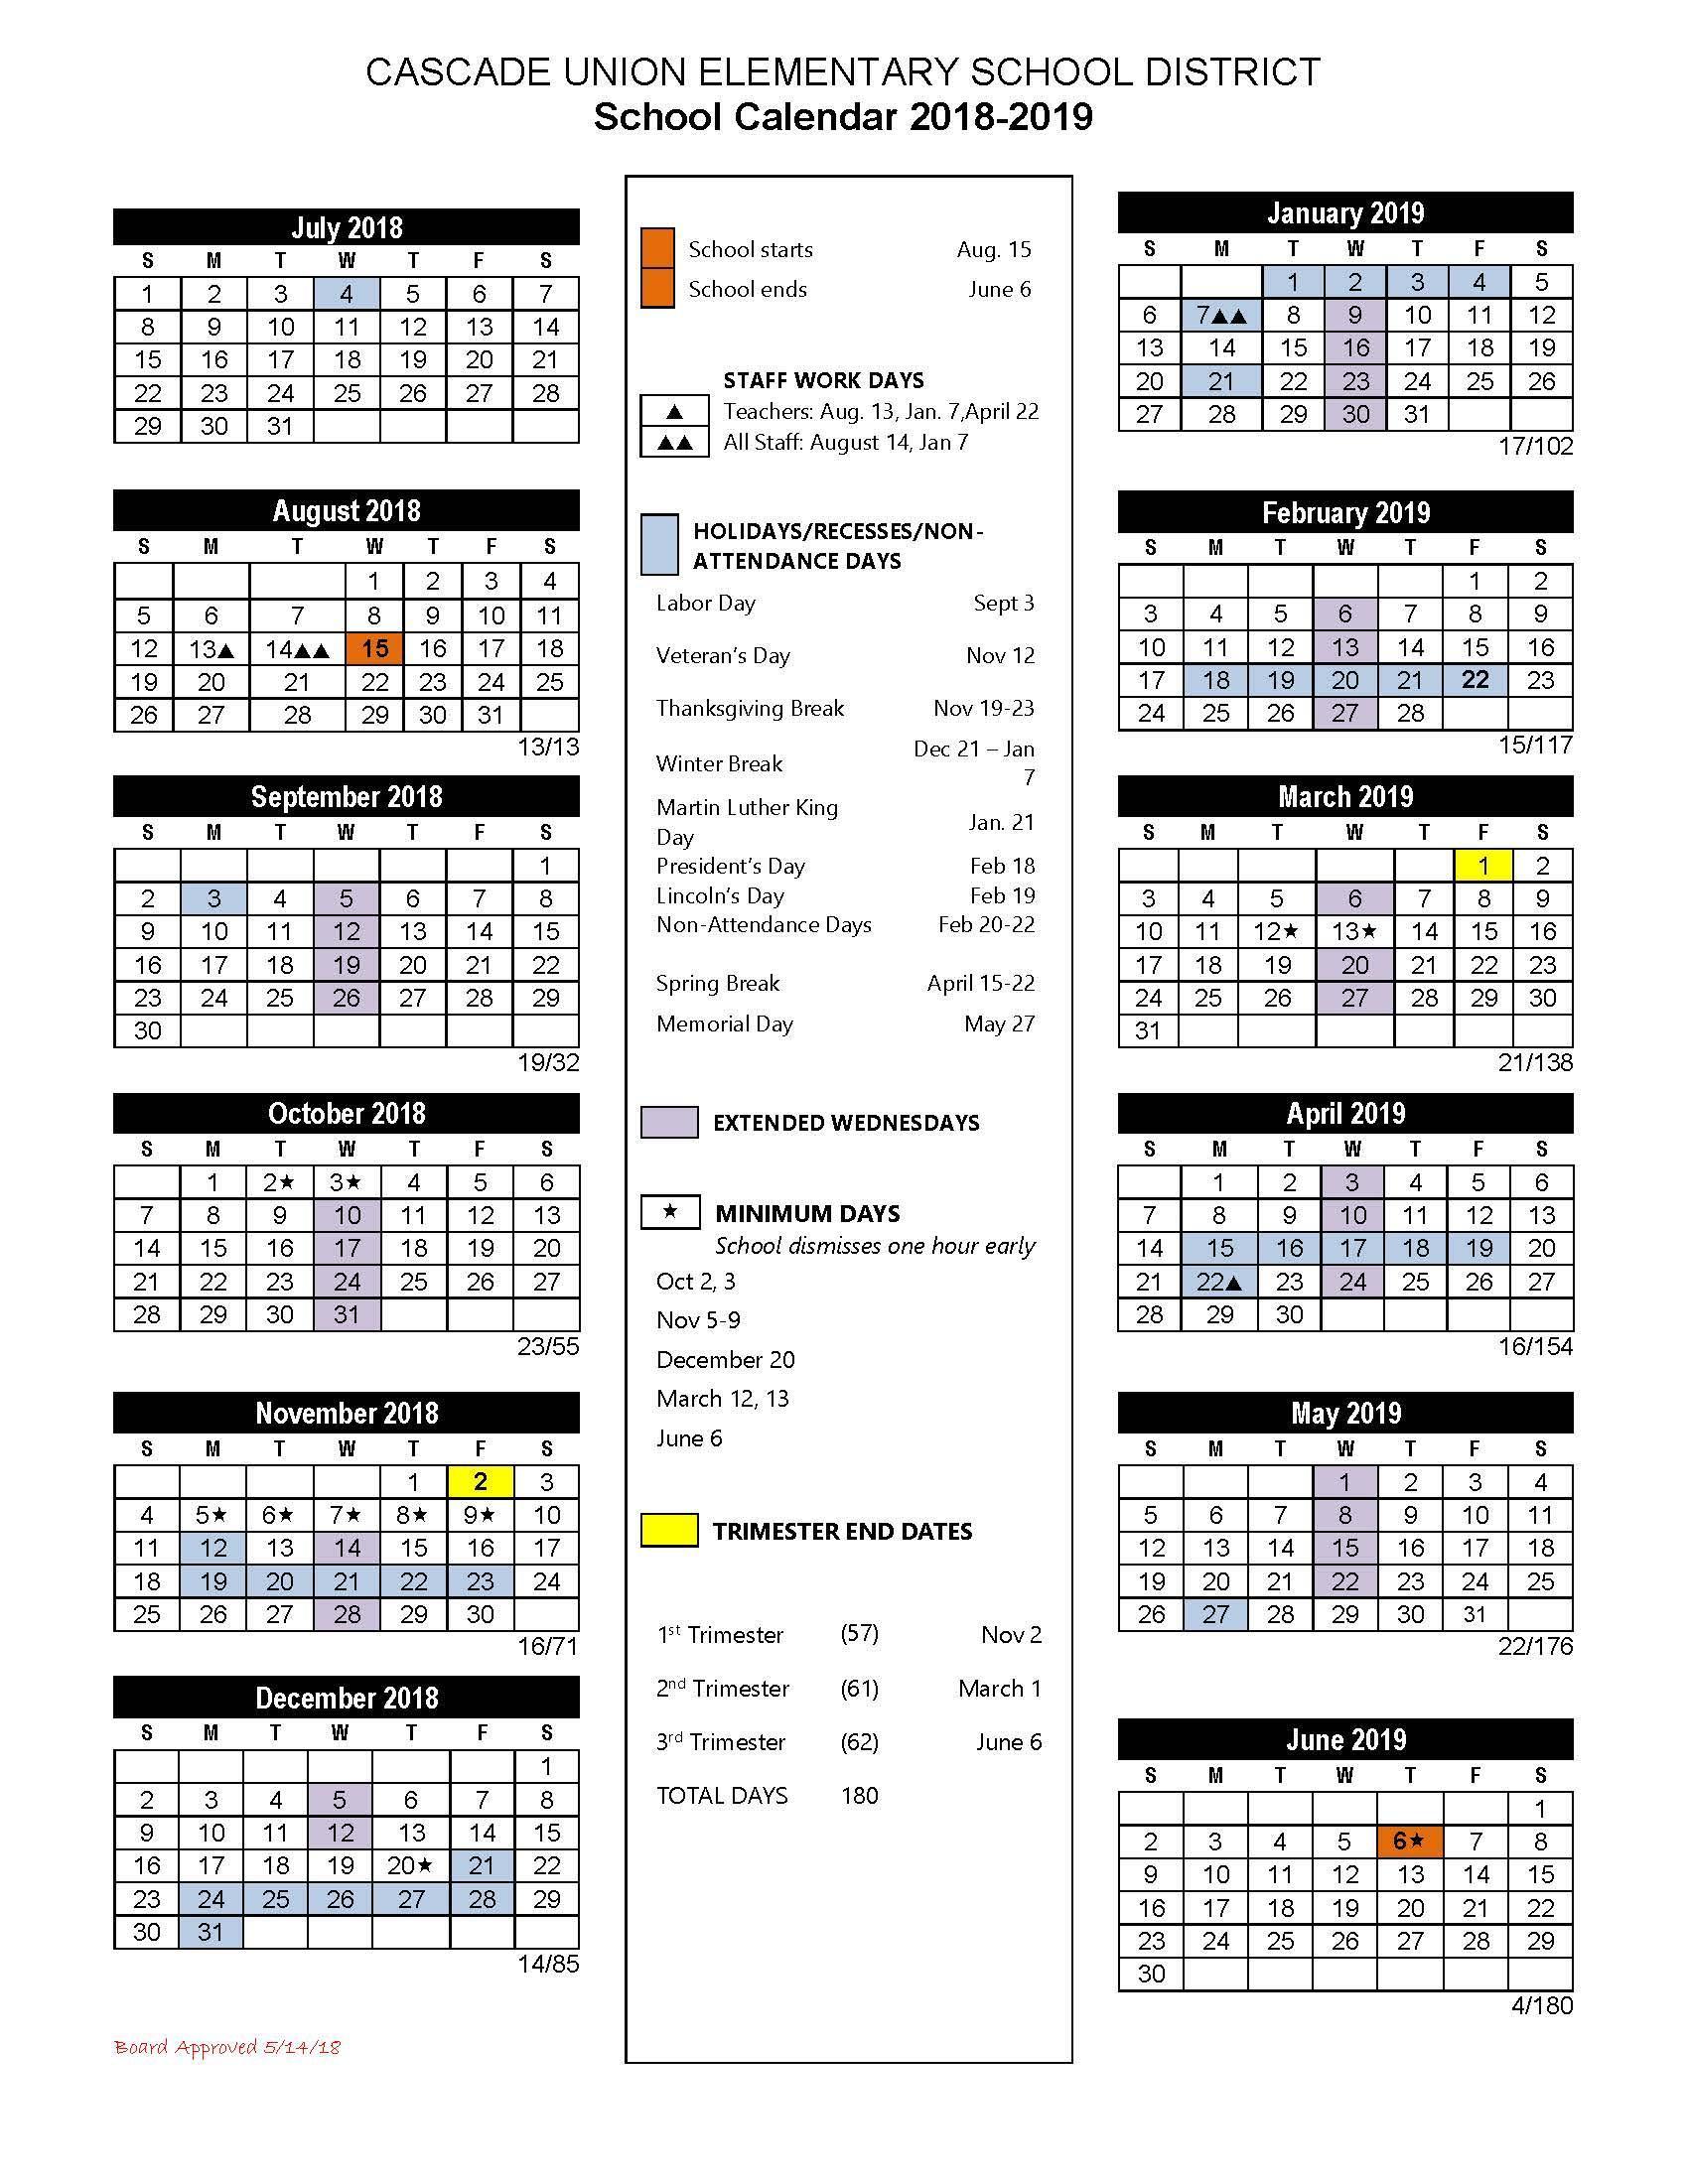 California School Calendar 2019 School Calendars – School Calendar – Cascade Union Elementary